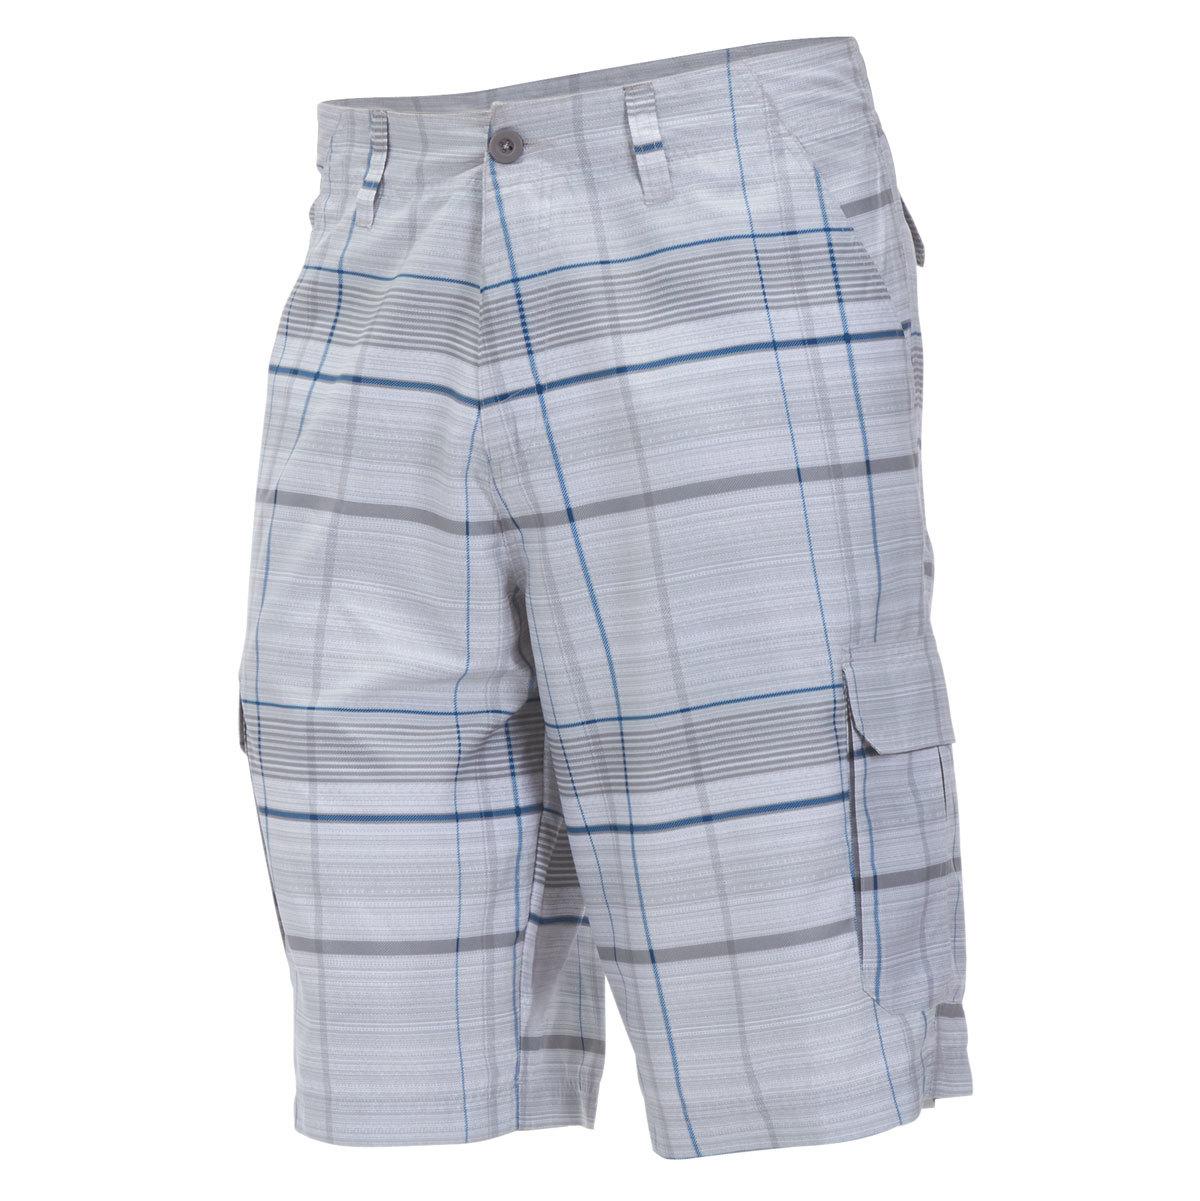 Burnside Guys' Microfiber Plaid Shorts - Black, 36